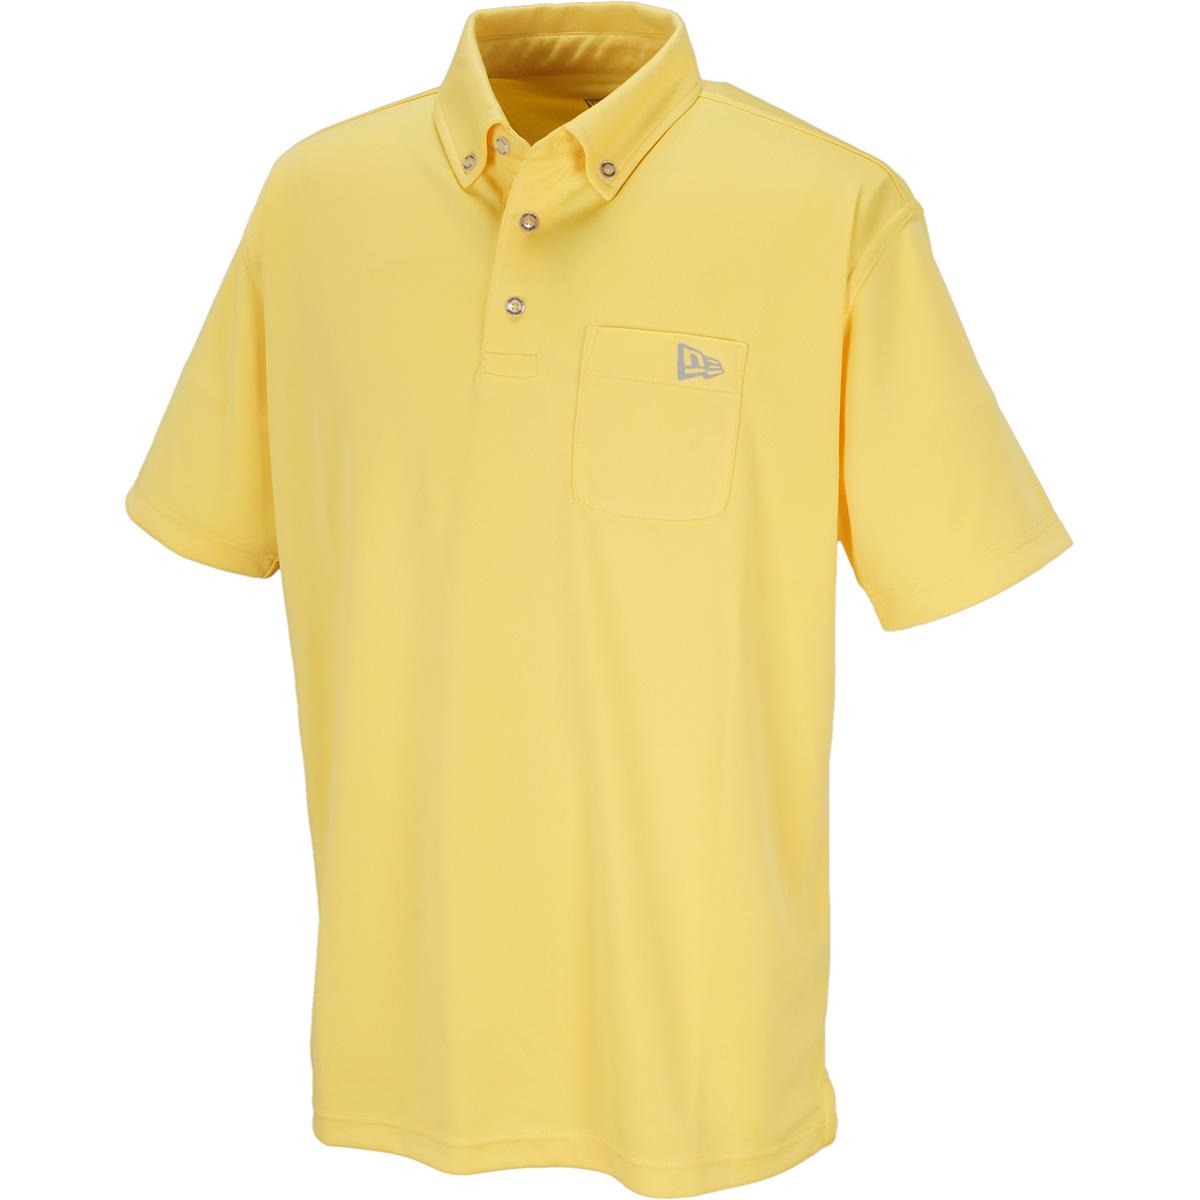 GOLF POCKET ボタンダウン半袖ポロシャツ